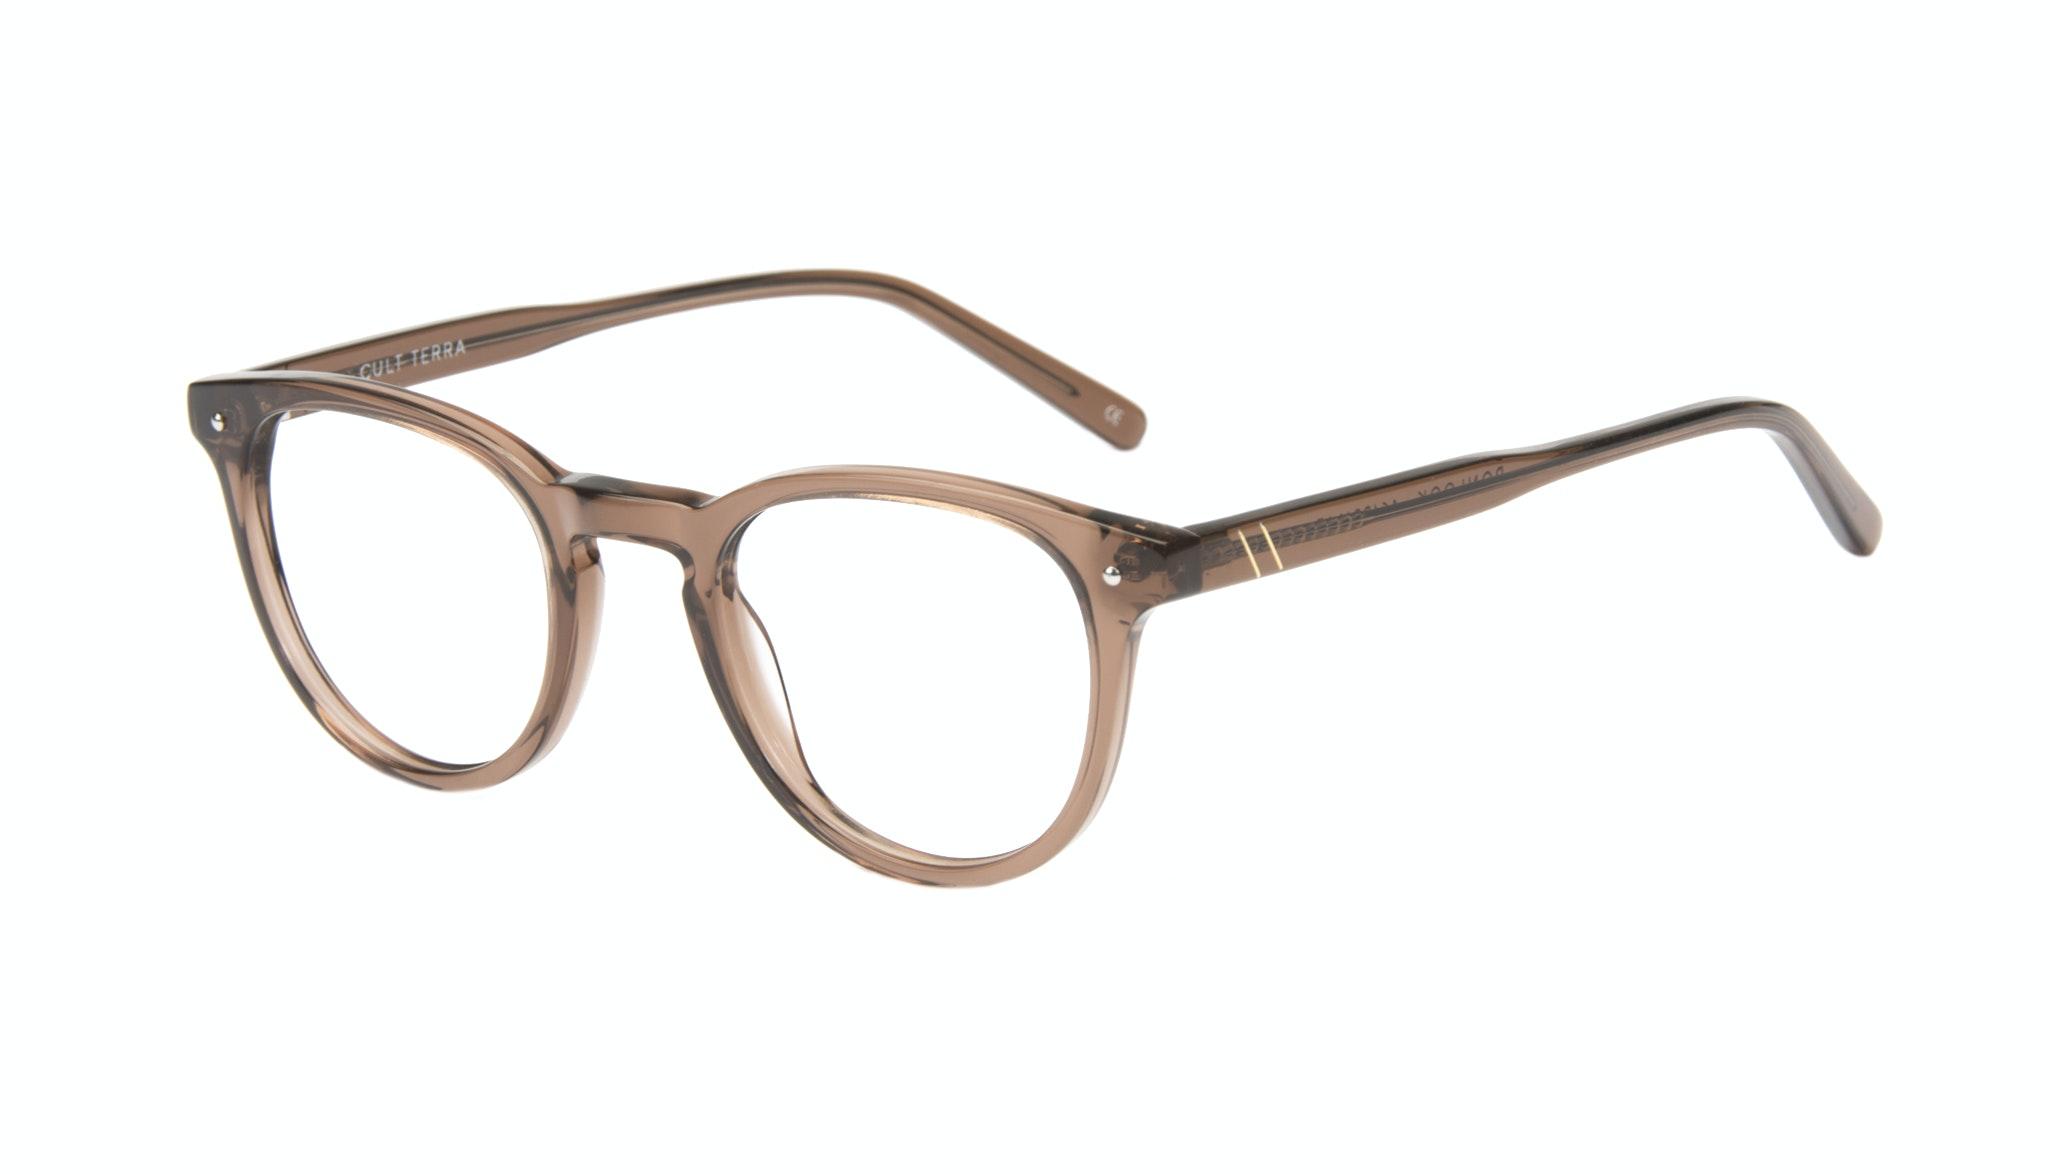 Affordable Fashion Glasses Round Eyeglasses Men Cult Terra Tilt